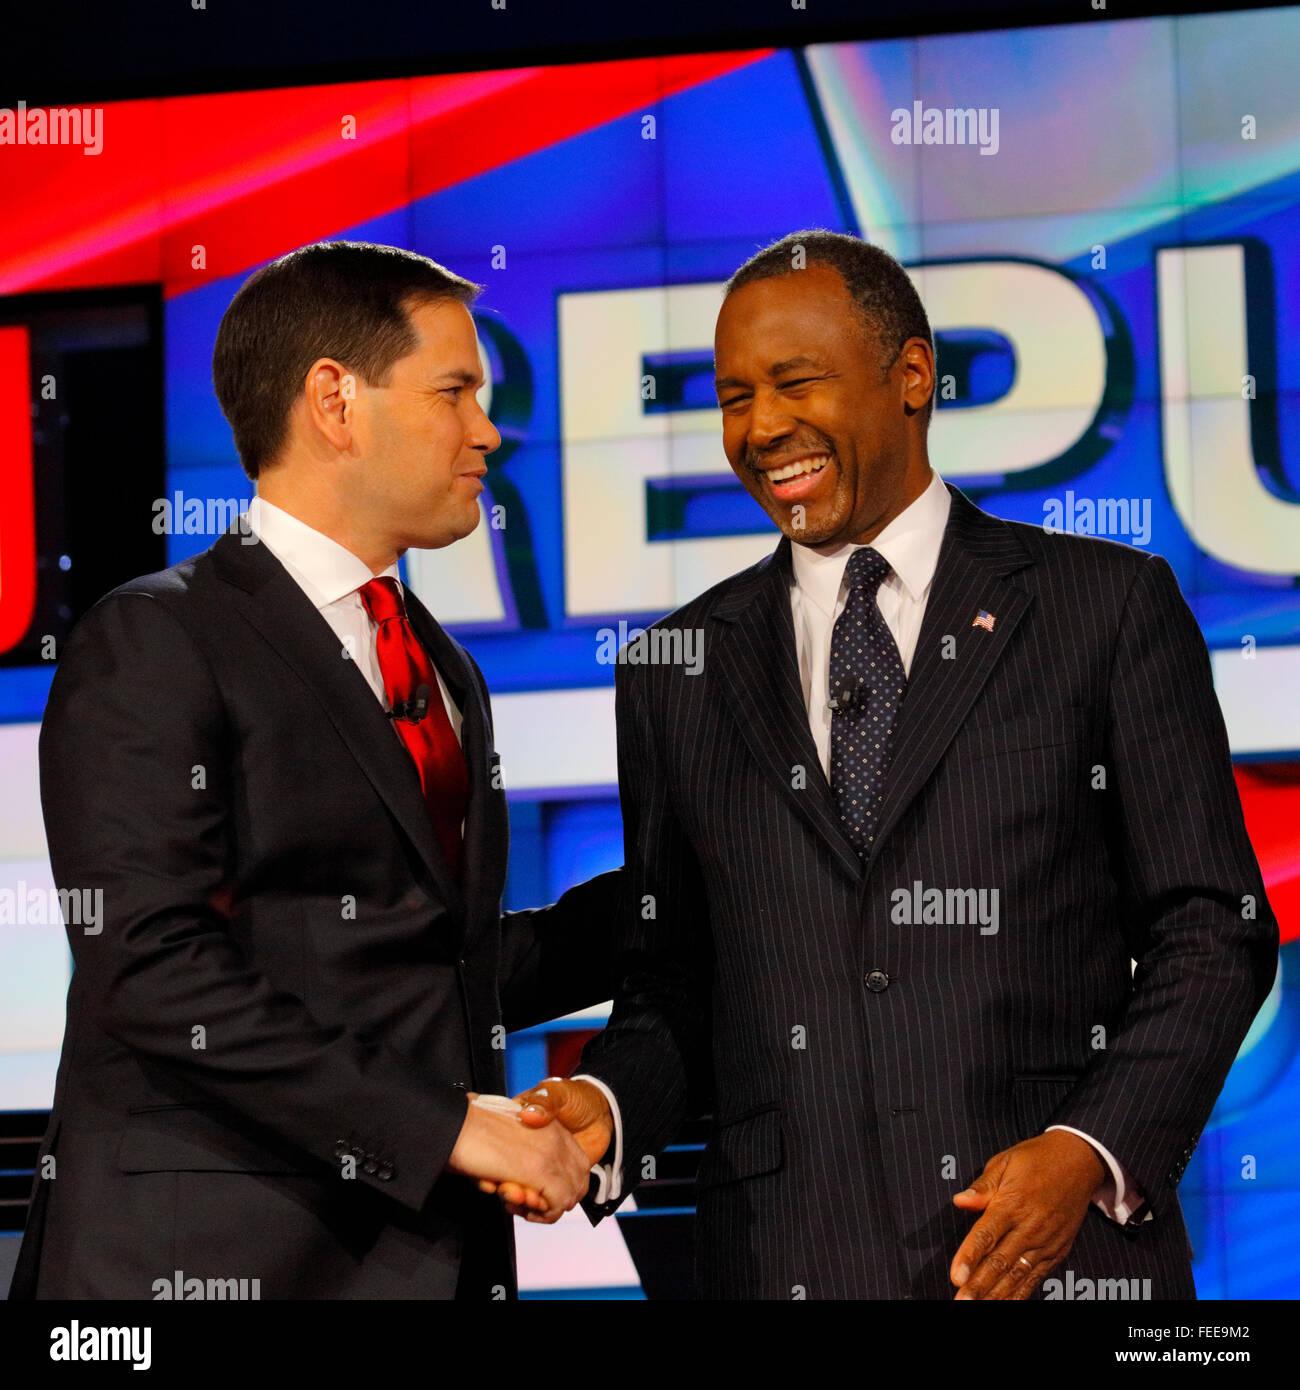 LAS VEGAS - DECEMBER 15: Republican presidential candidate former Dr. Ben Carson shakes hands with Senator Marco Rubio at CNN republican presidential debate at Venetian, December 15, 2015, Las Vegas, Nevada Stock Photo